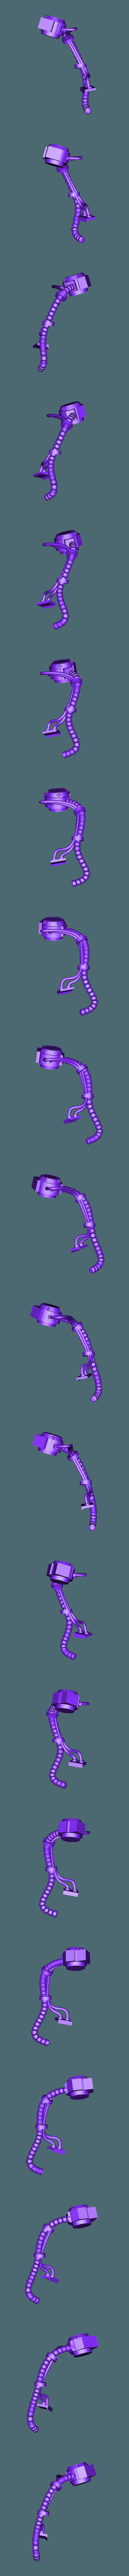 Aggressor_3_Left_Hoses.stl Download free STL file Flame Armed Instigators • 3D printable template, danny_cyanide